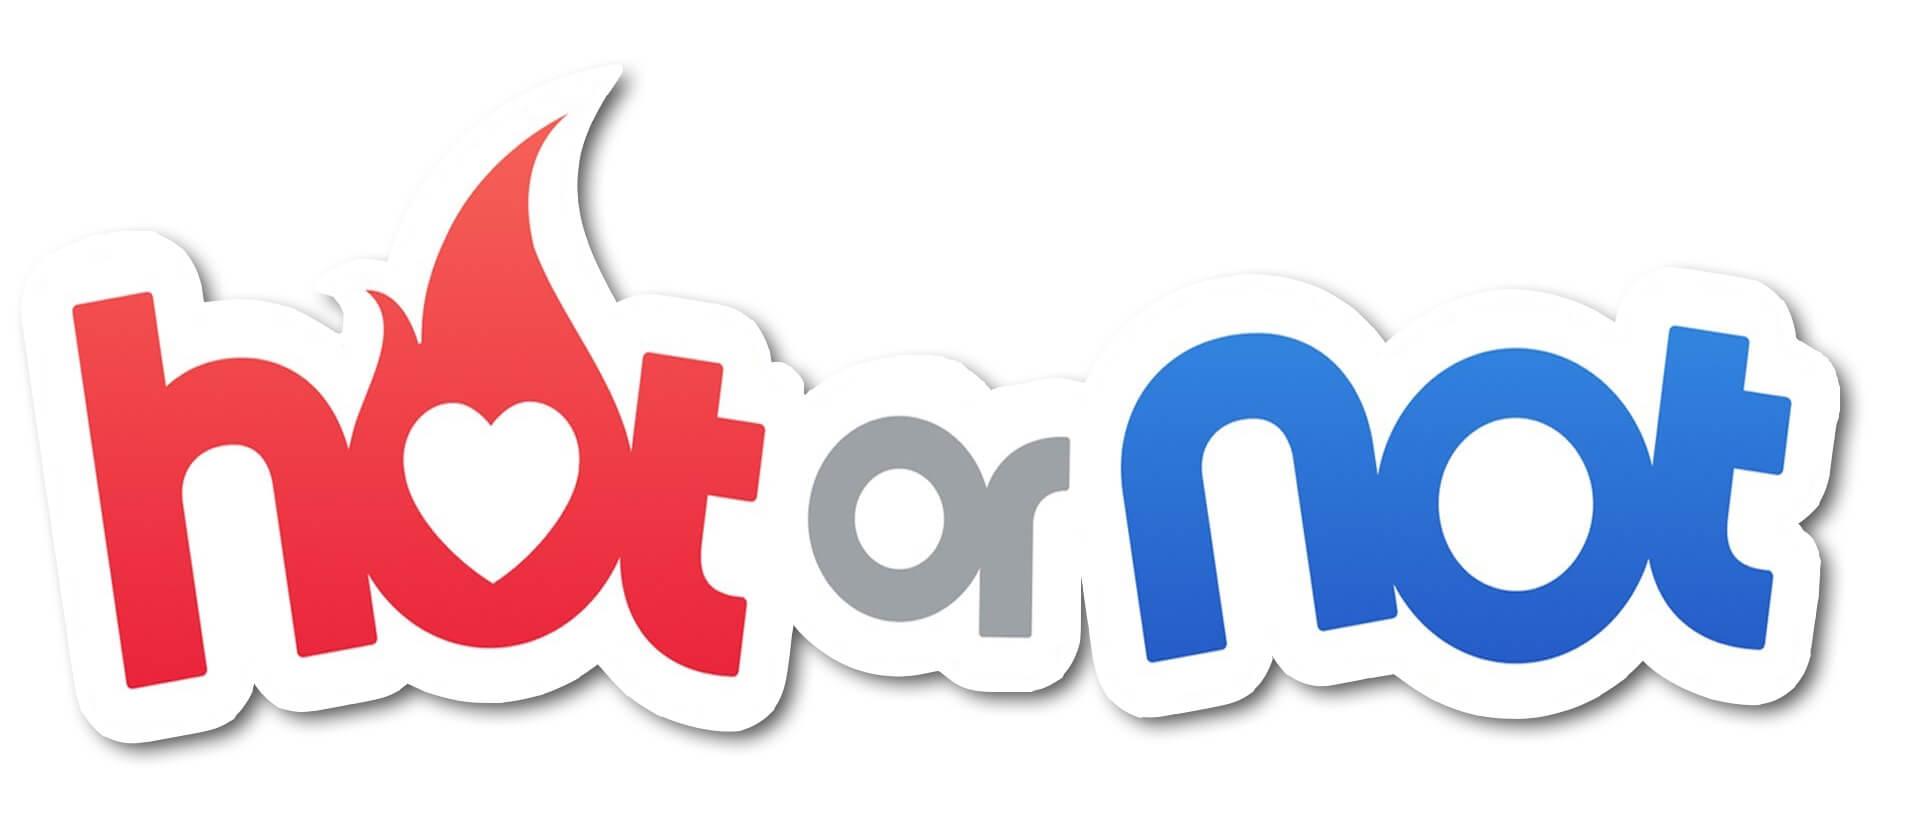 Hot or Not logo